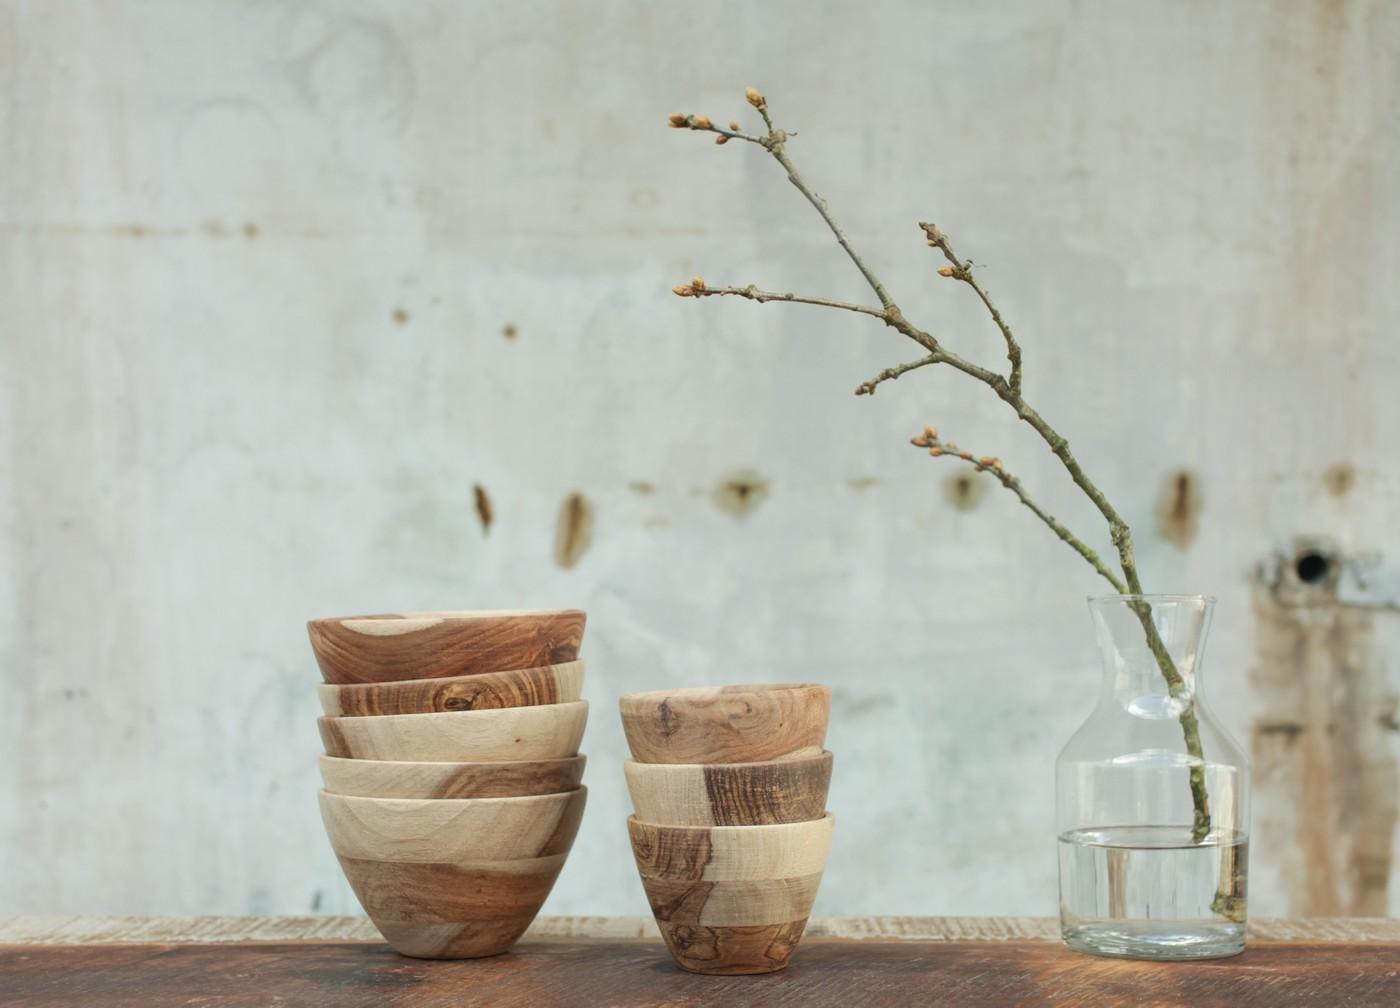 Atu wooden bowl